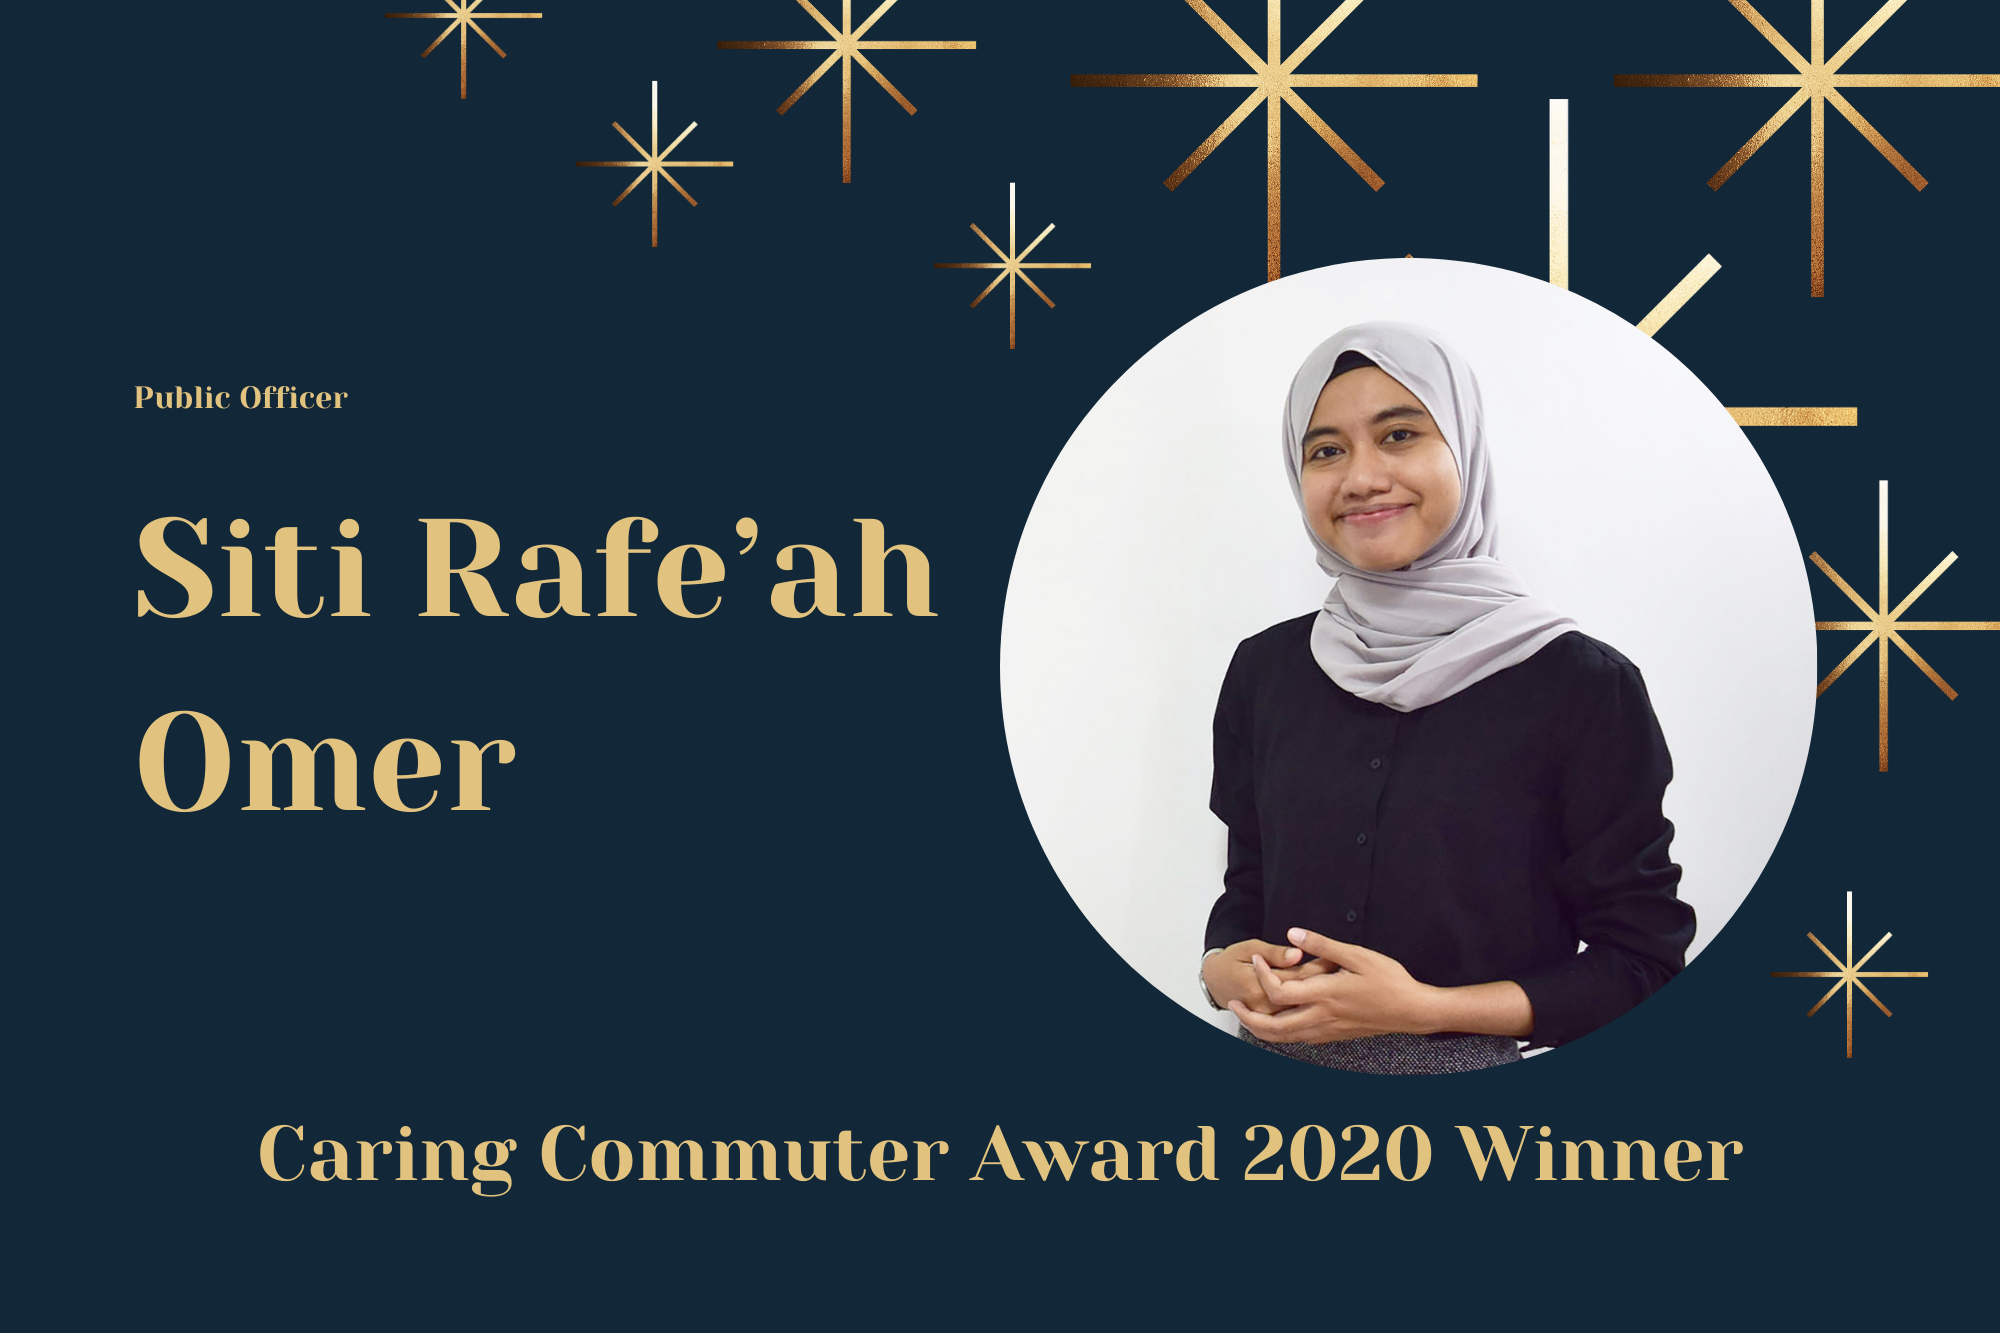 Meet Rafe'ah, Undergraduate and Caring Commuter Award 2020 Winner